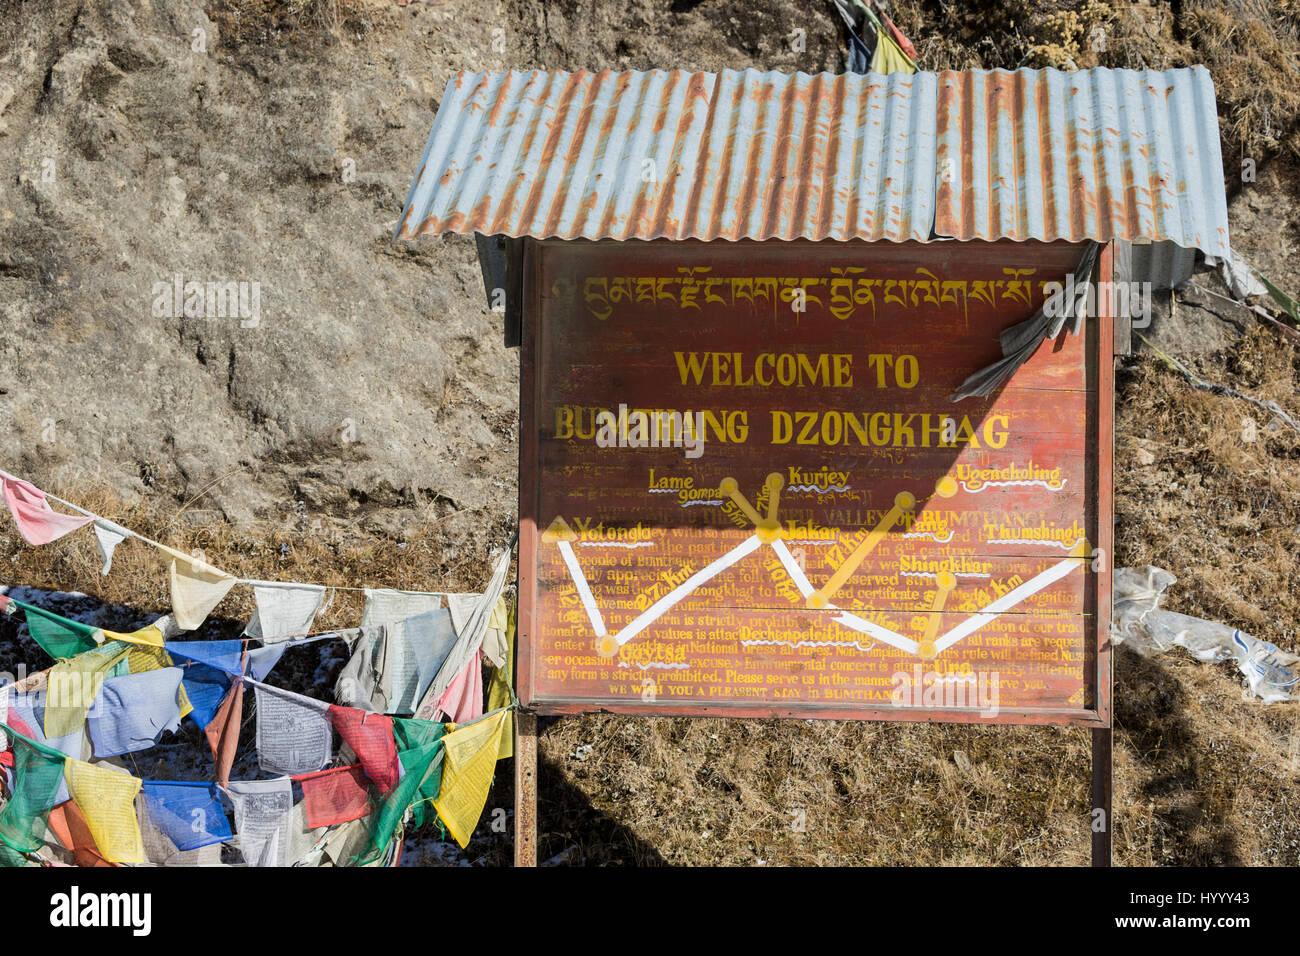 Bumthang Dzonghag sign with prayer flags (Bhutan) - Stock Image